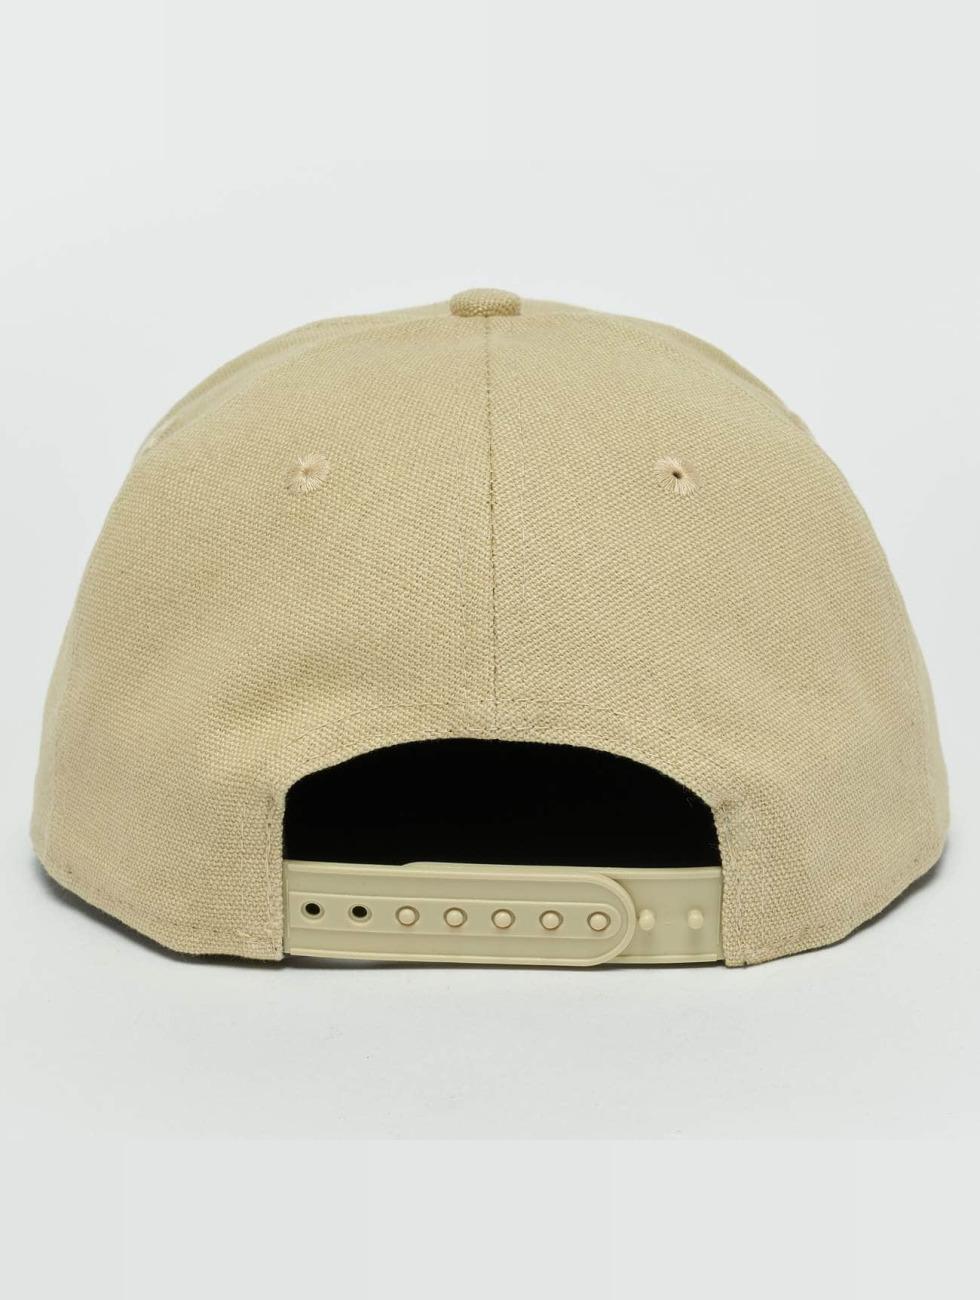 New Era Casquette Snapback & Strapback Canvas LA Dodgers 9Fifty beige